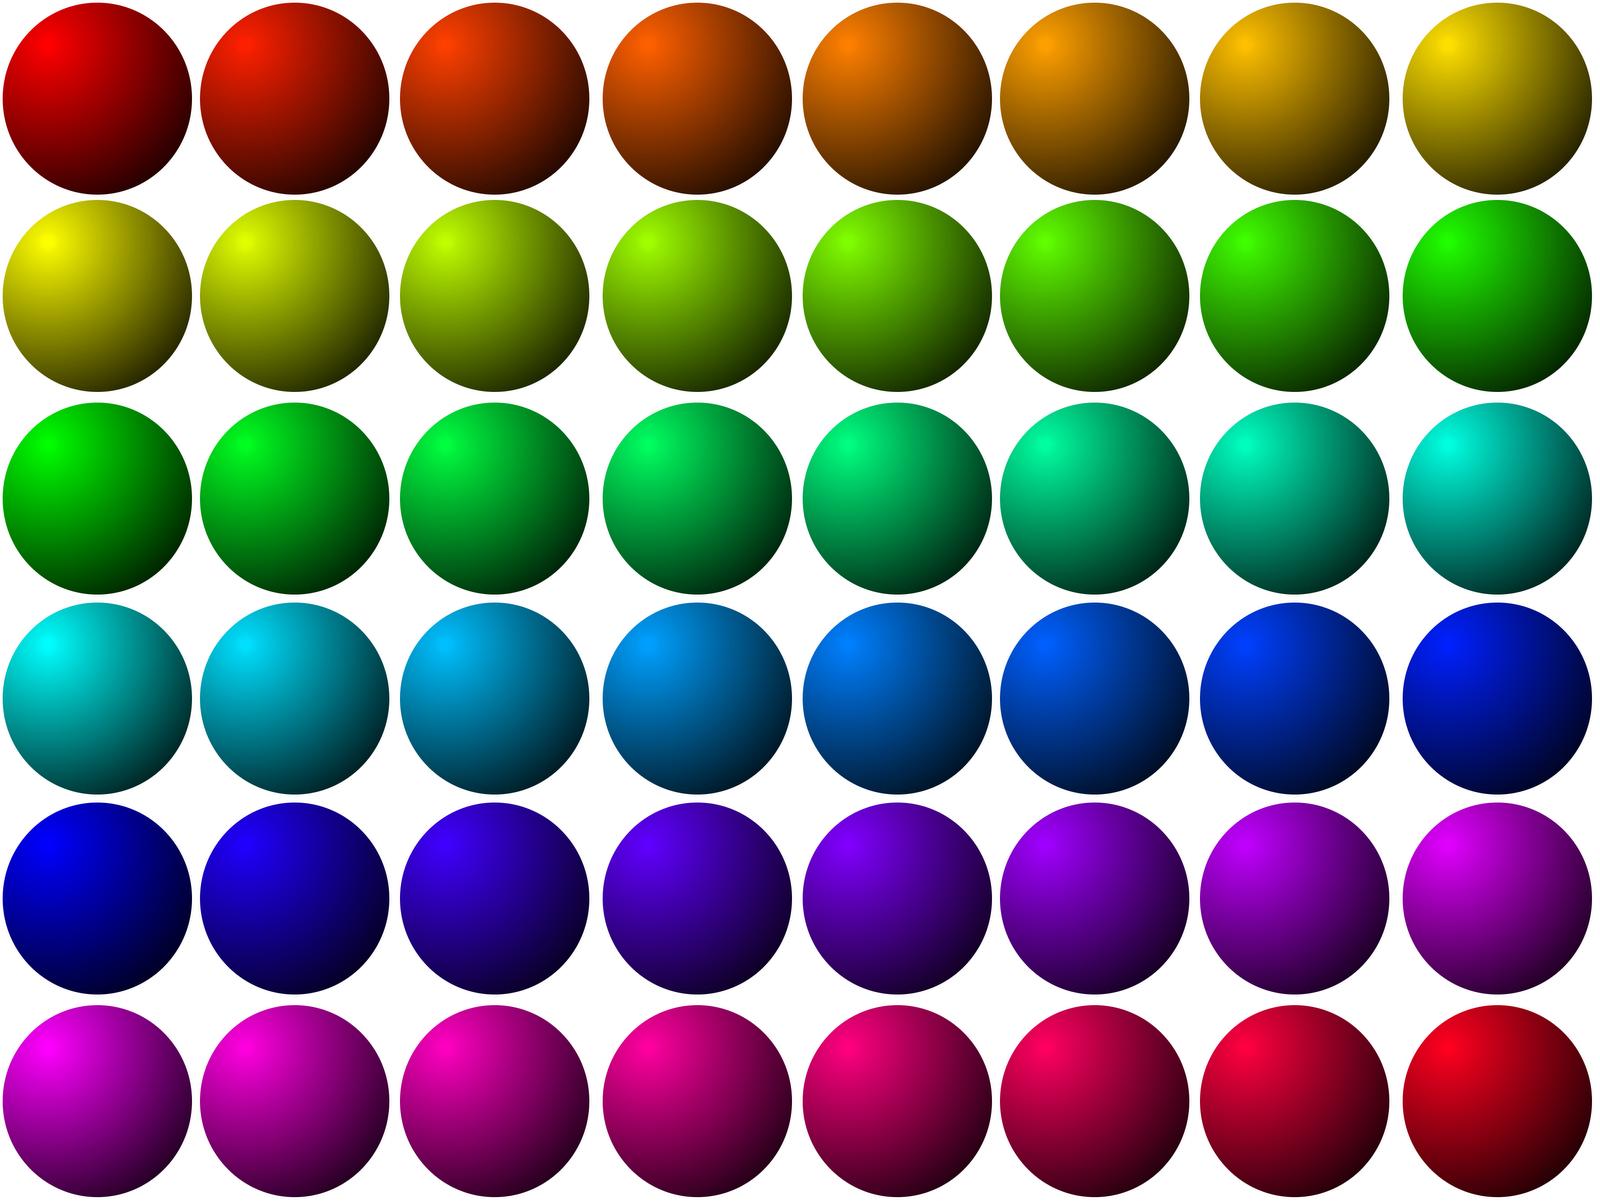 clipart pictures templates rh clipartpicturestemplates blogspot com sphere clipart free sphere clipart free